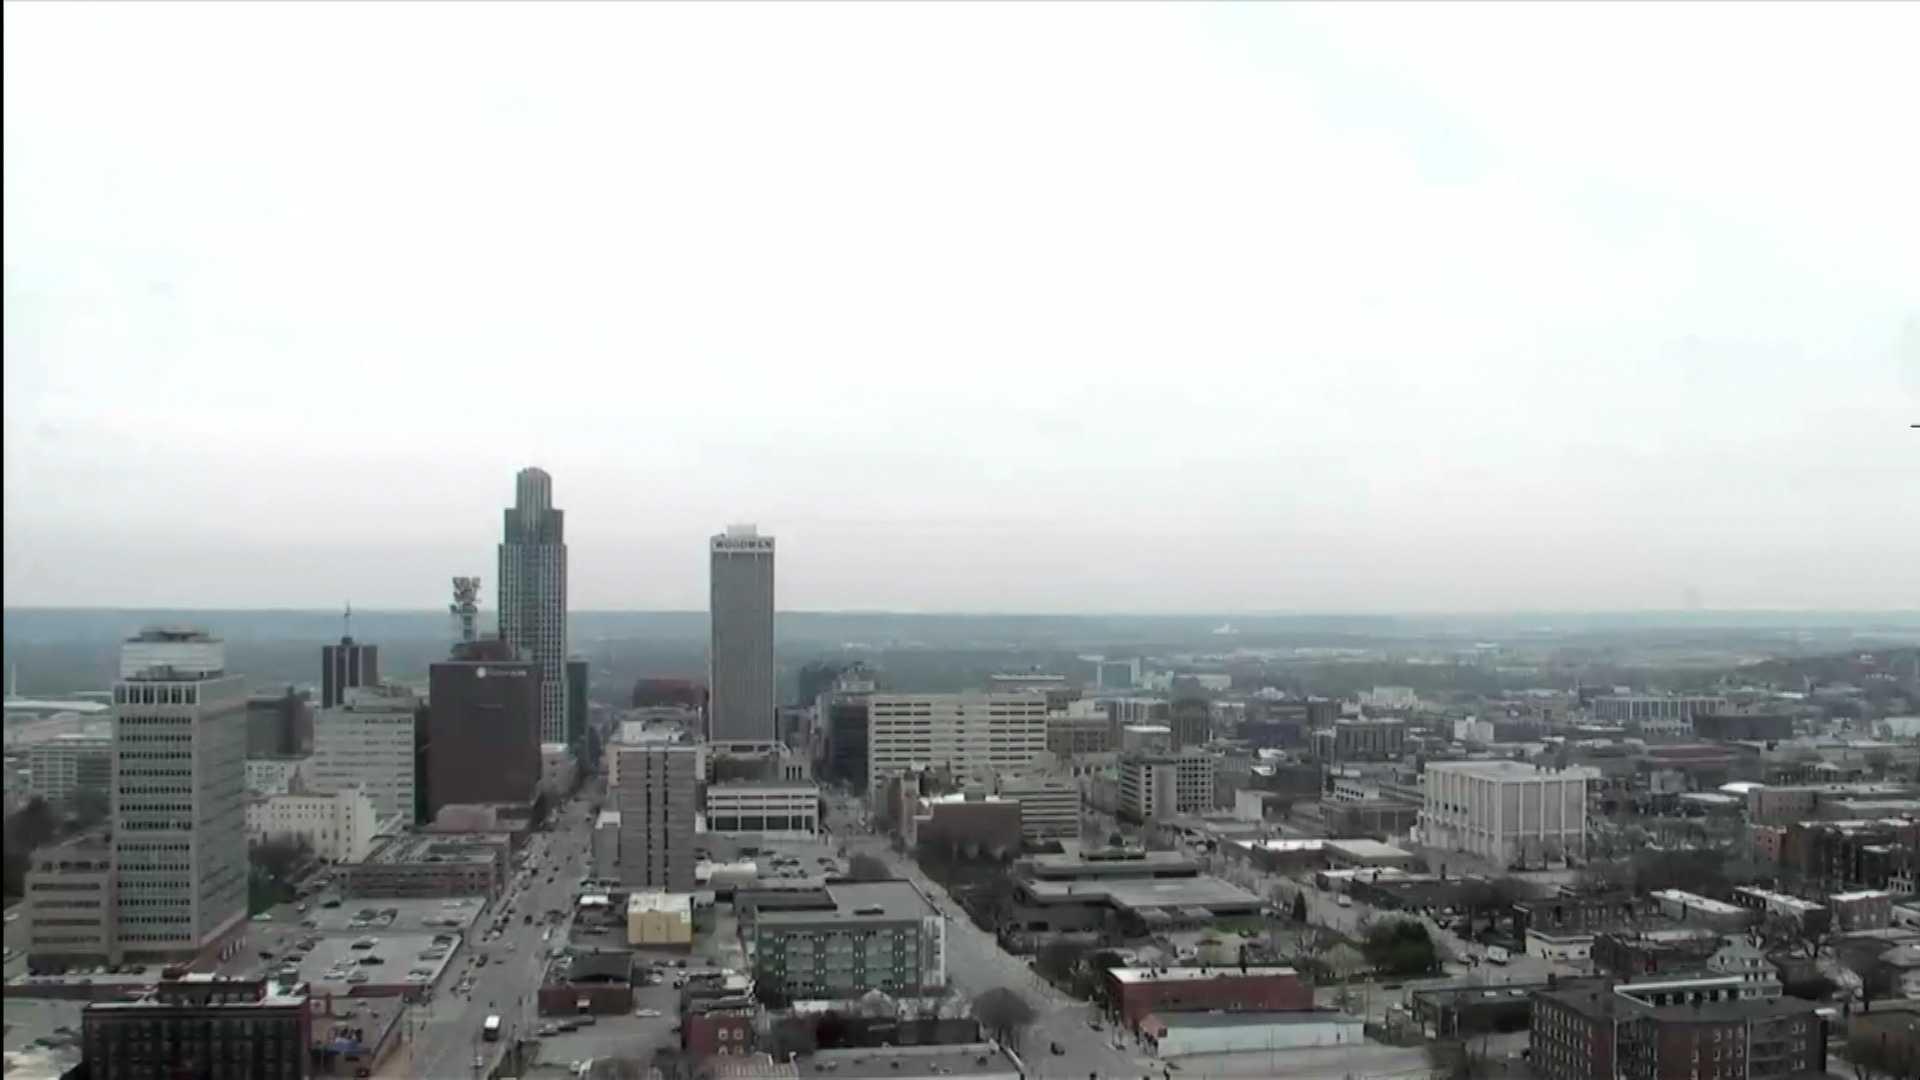 Nebraska officials plan to complain to Kansas about smoke